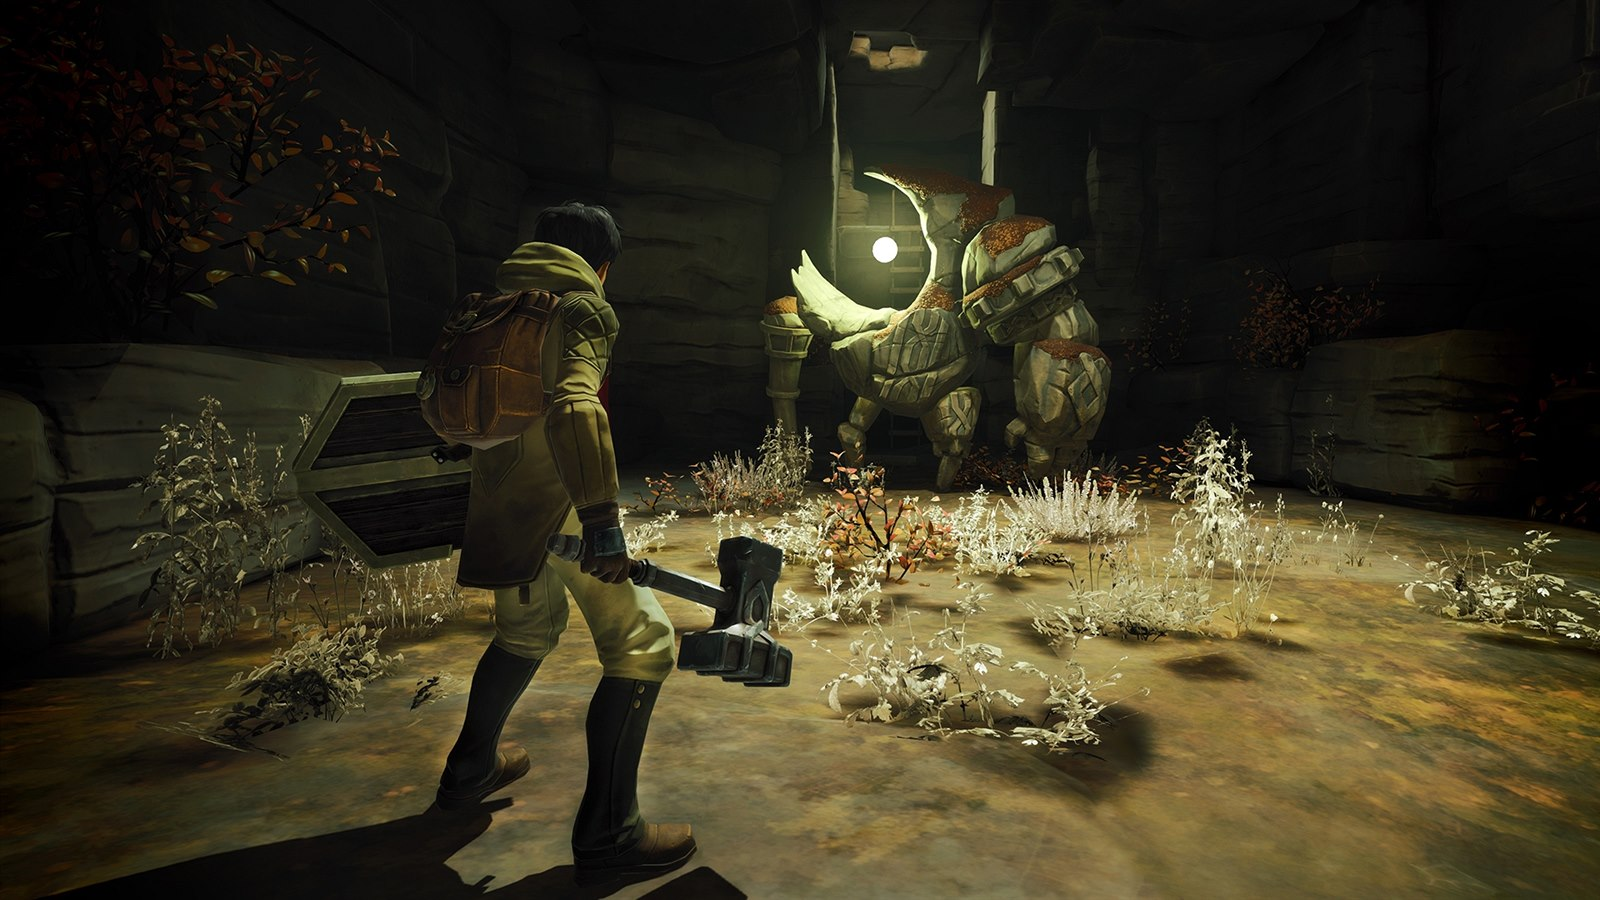 Představeno akční RPG Chronos: Before the Ashes